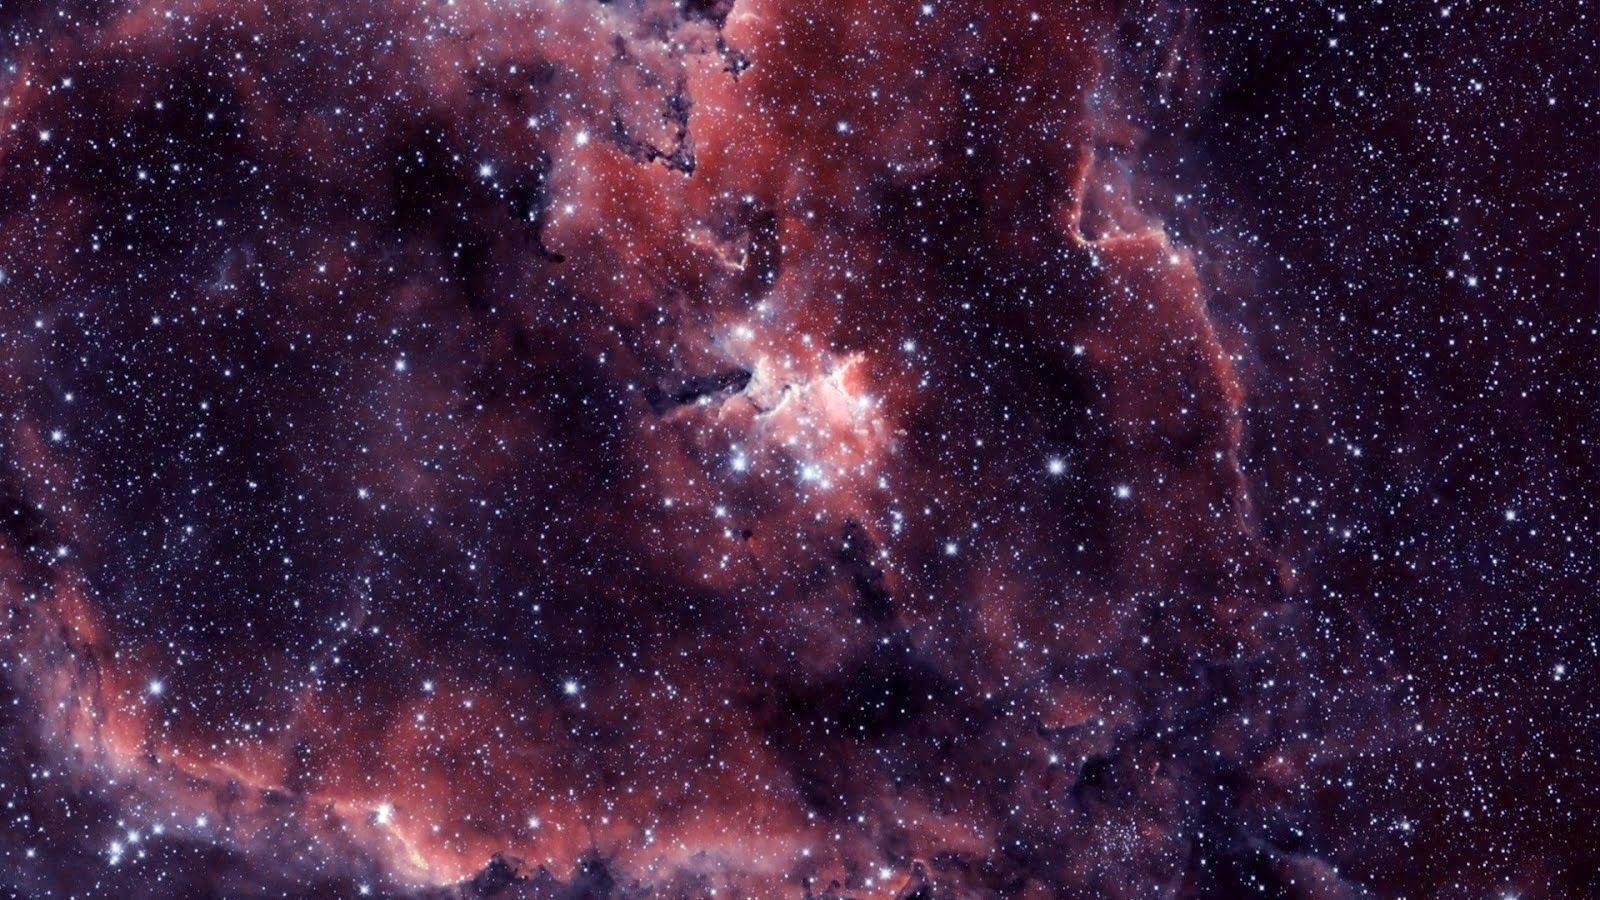 Hd wallpaper galaxy - Galaxy Hd Wallpapers Backgrounds Wallpaper 1920 1080 Hd Galaxy Wallpaper 27 Wallpapers